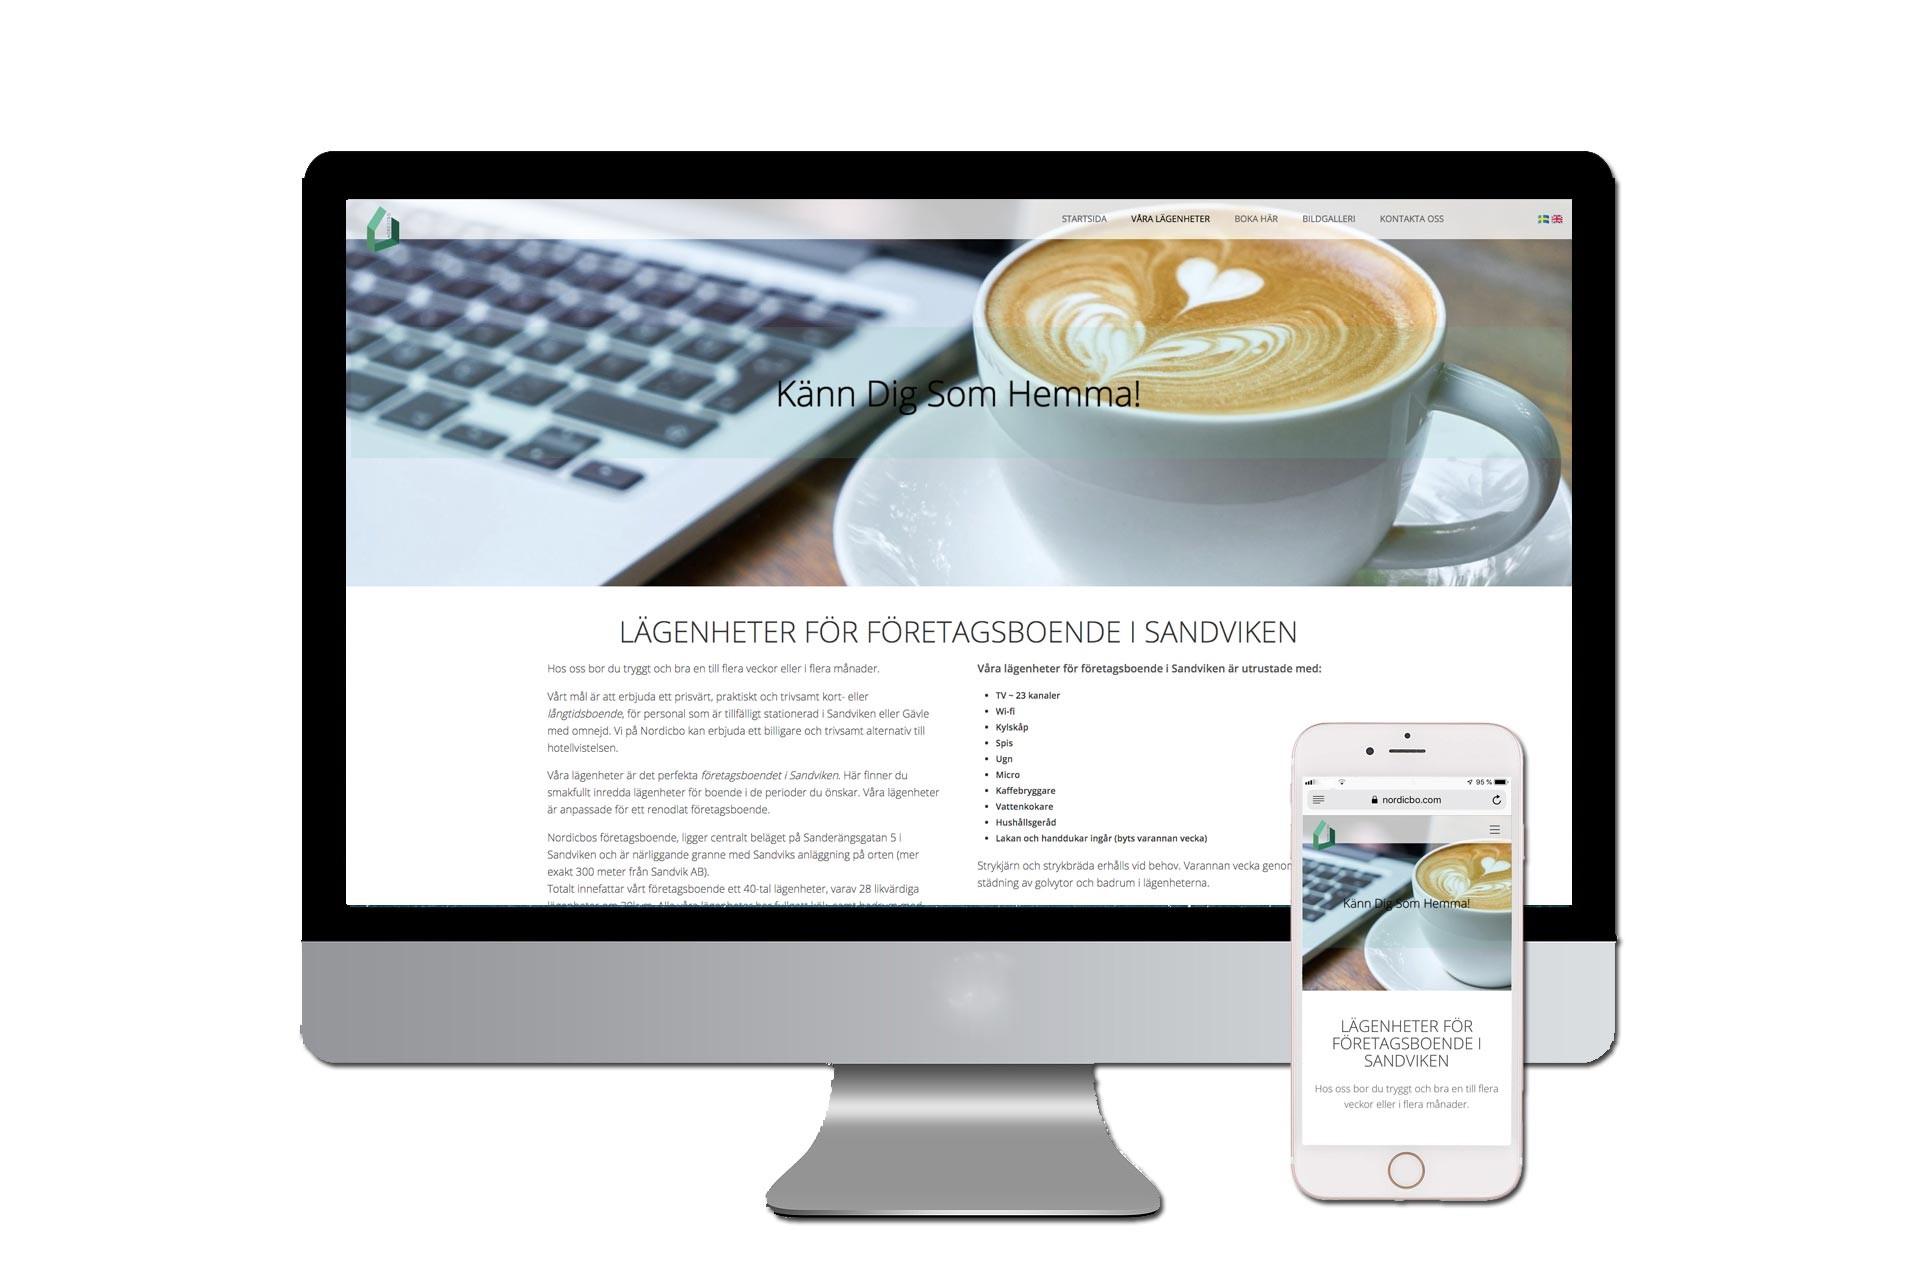 Webblösningar i Responsiv design